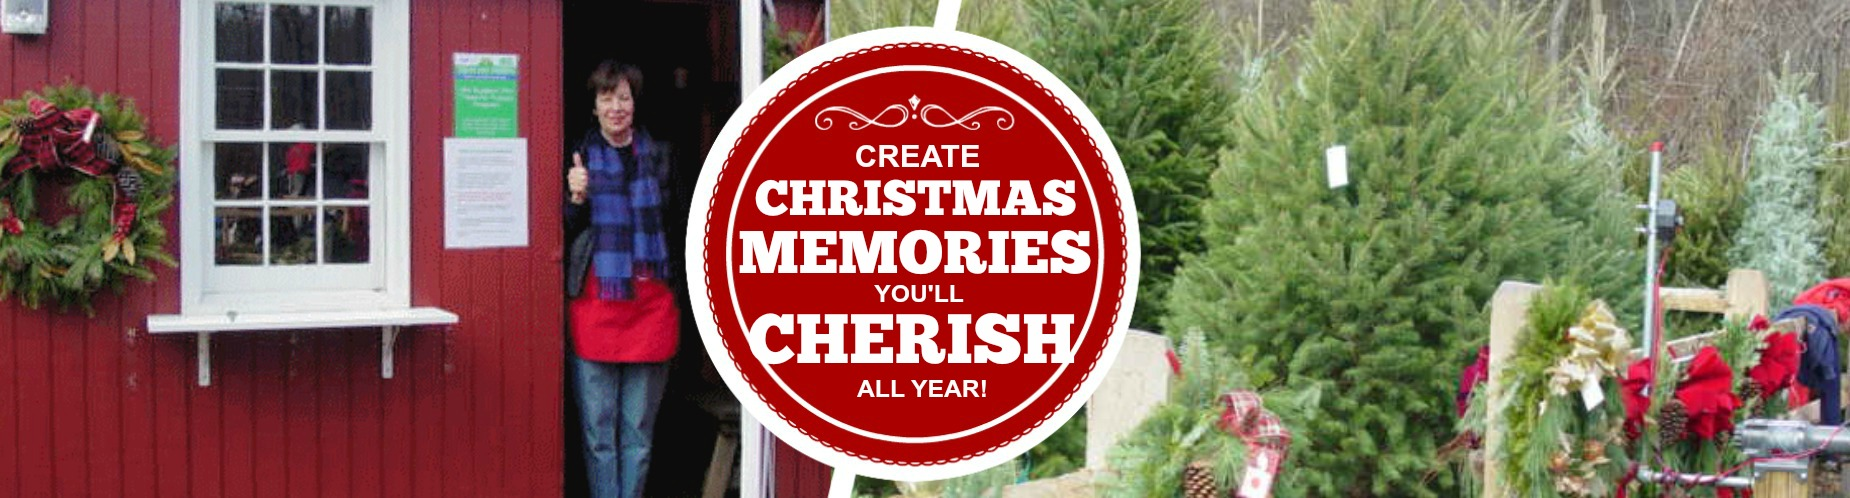 Crete Christmas Memories ALL YEAR